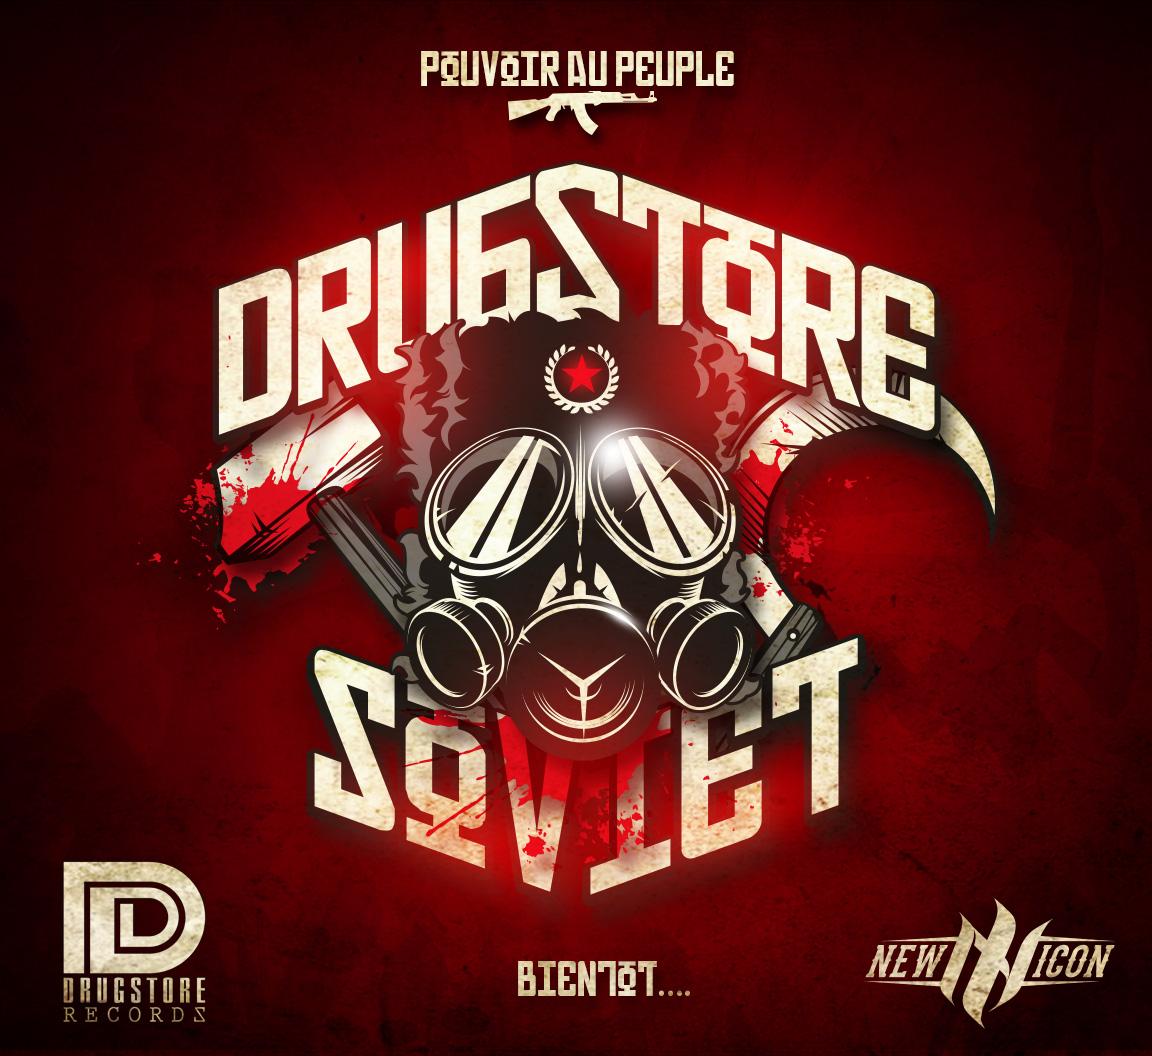 DRUGSTORE RECORDS